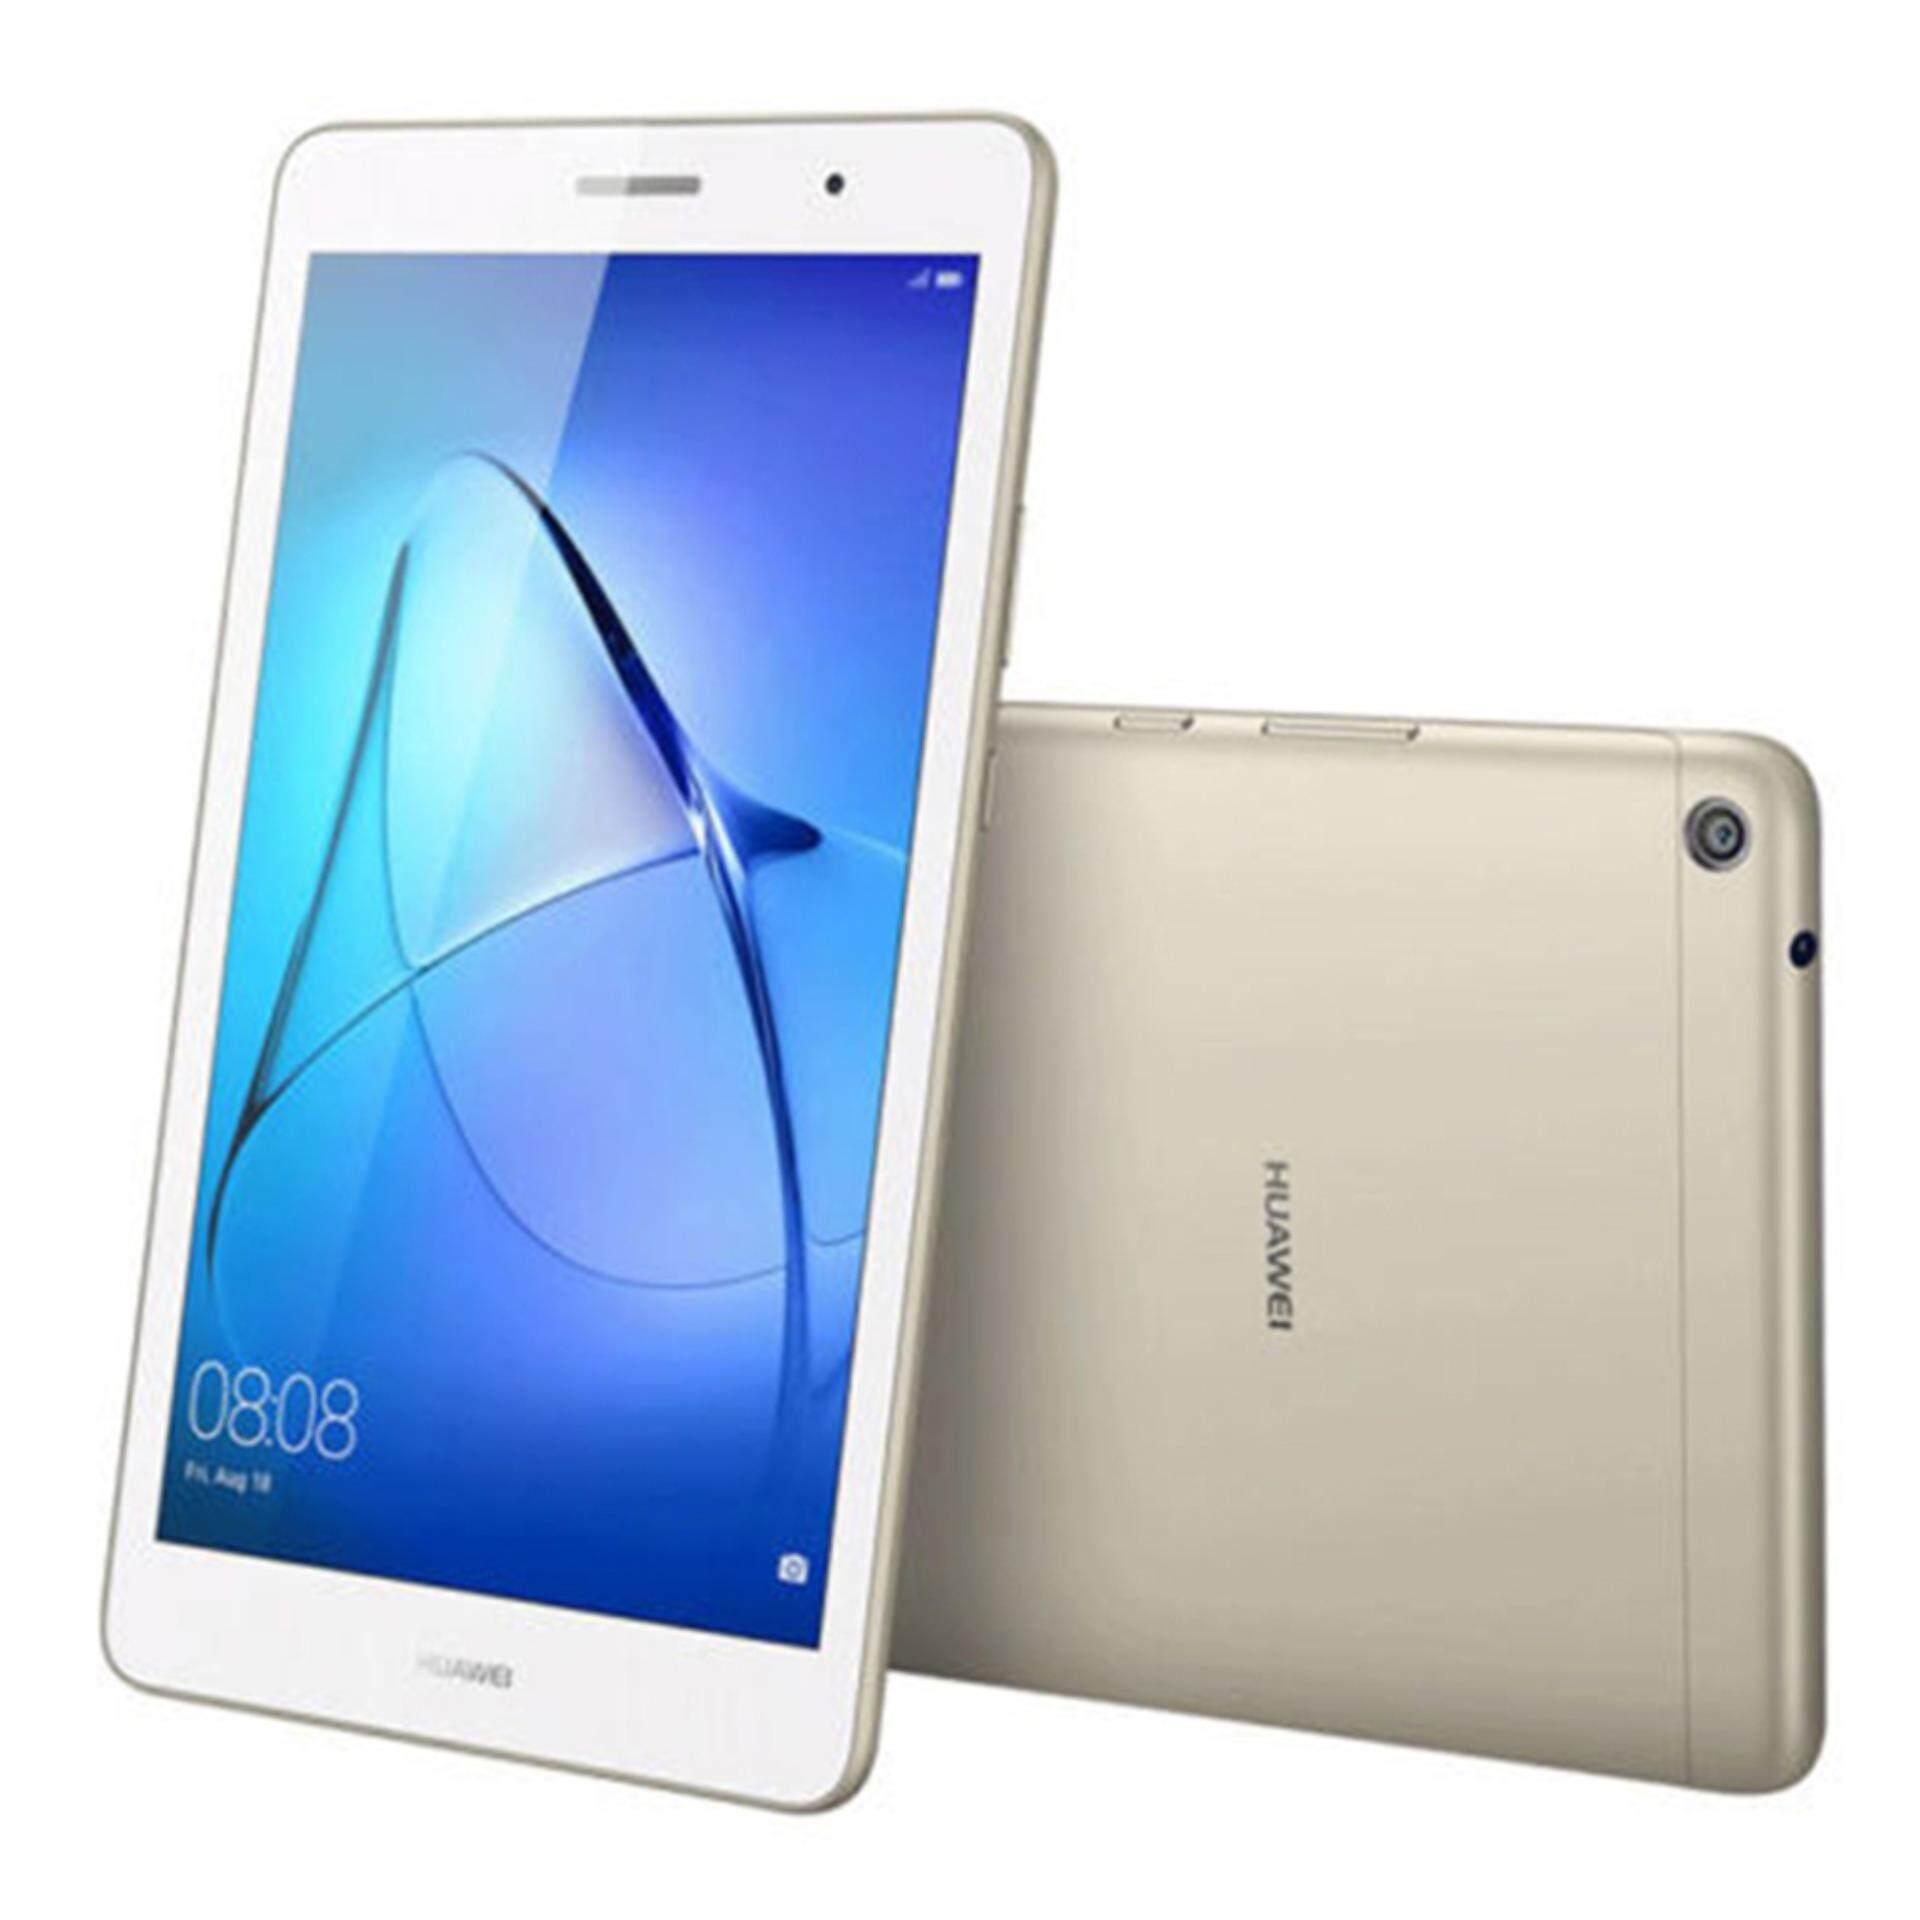 HUAWEI Honor T3 KOB-L09 Quad-Core 8.0inch HD Wifi+LTE 3G+32G 5MP+2MP Camera